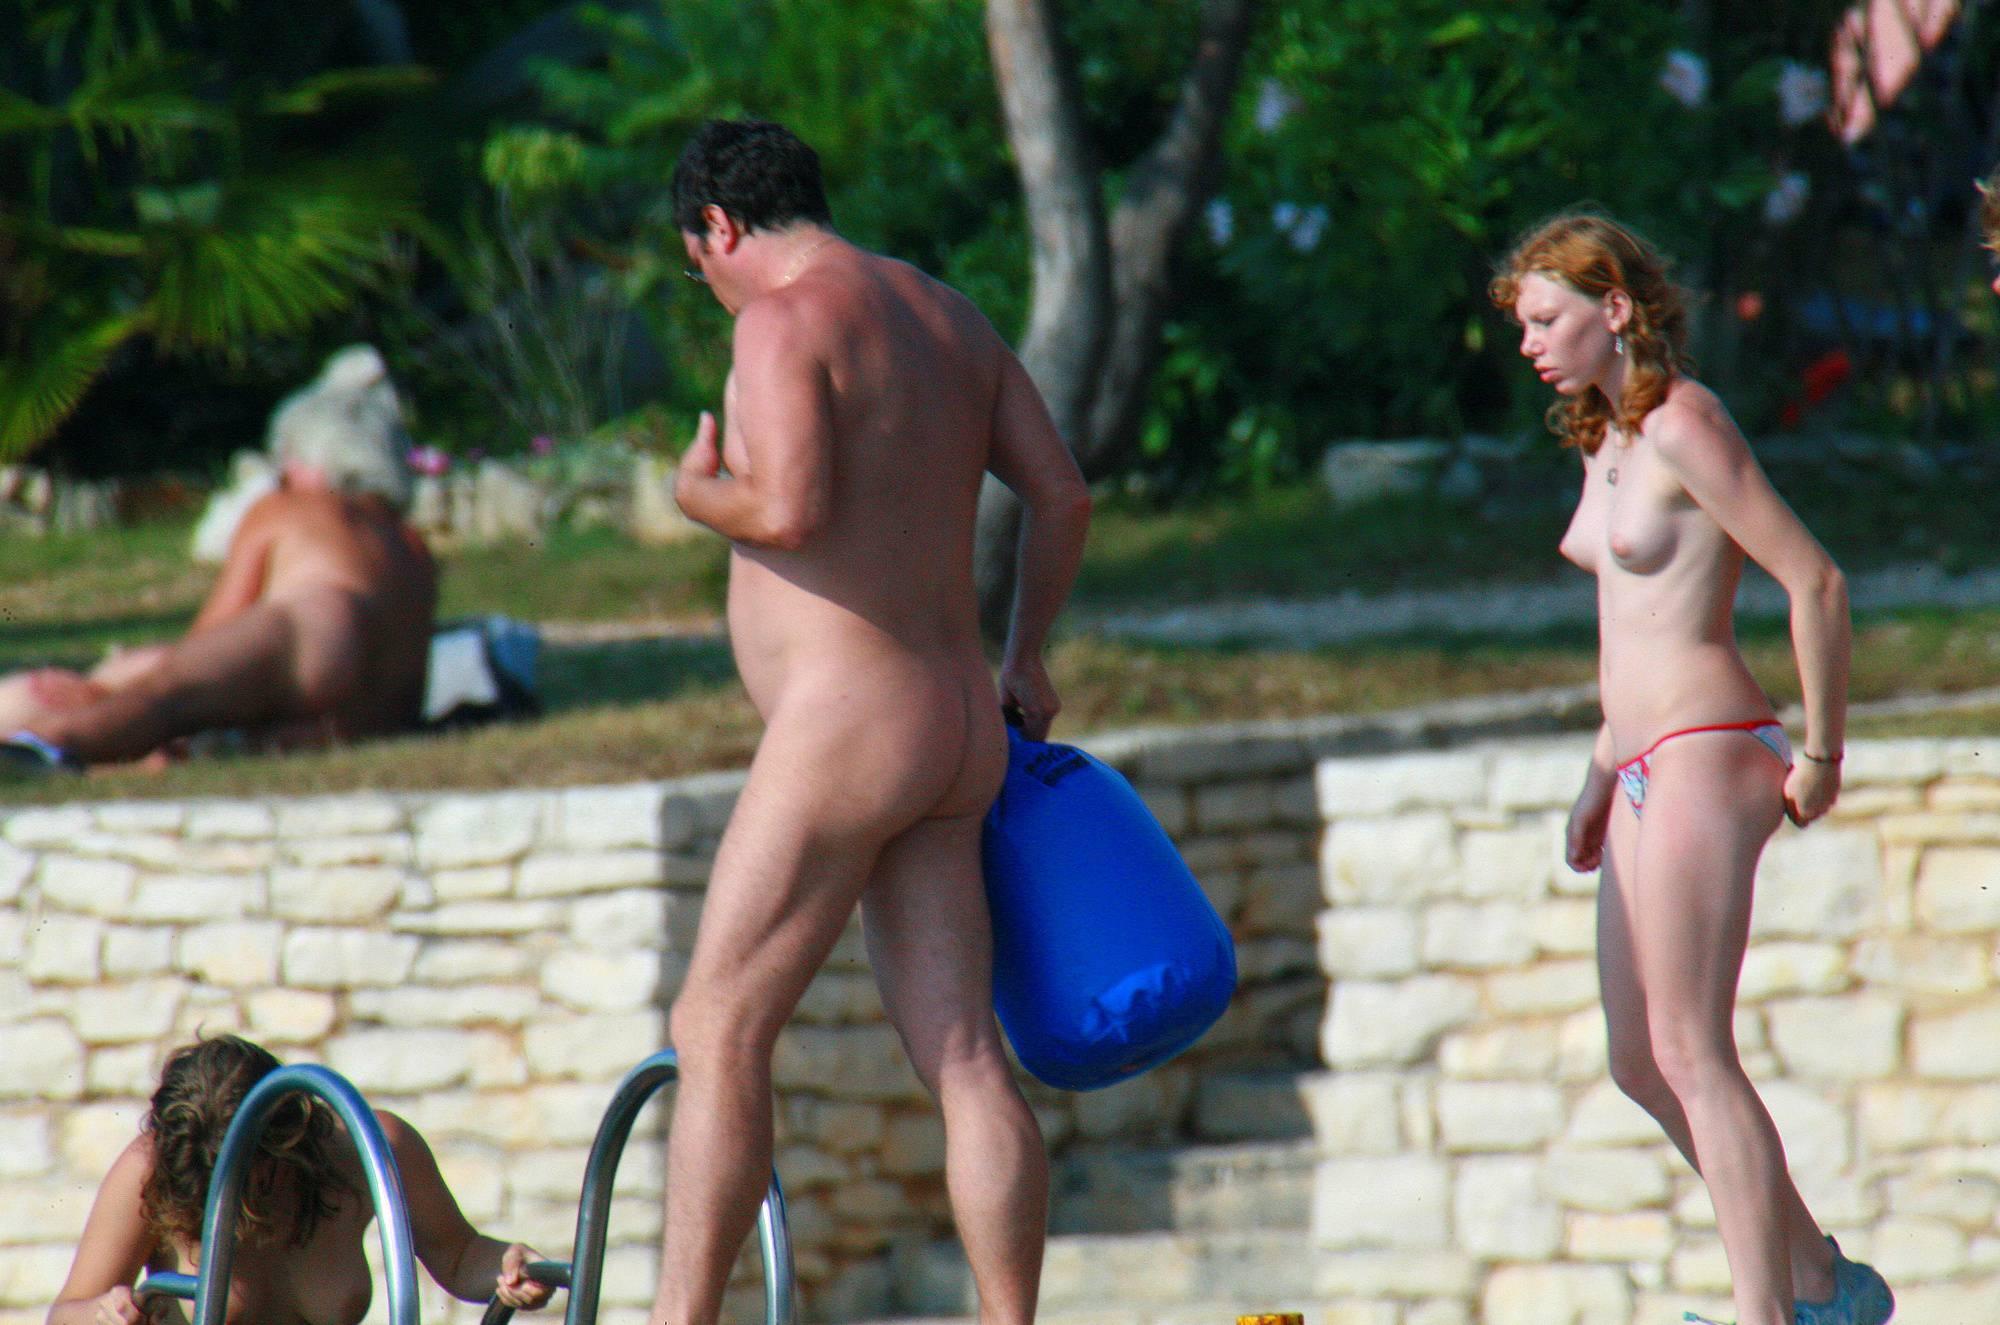 Nudist Photos Ula FKK Exploration Family - 2